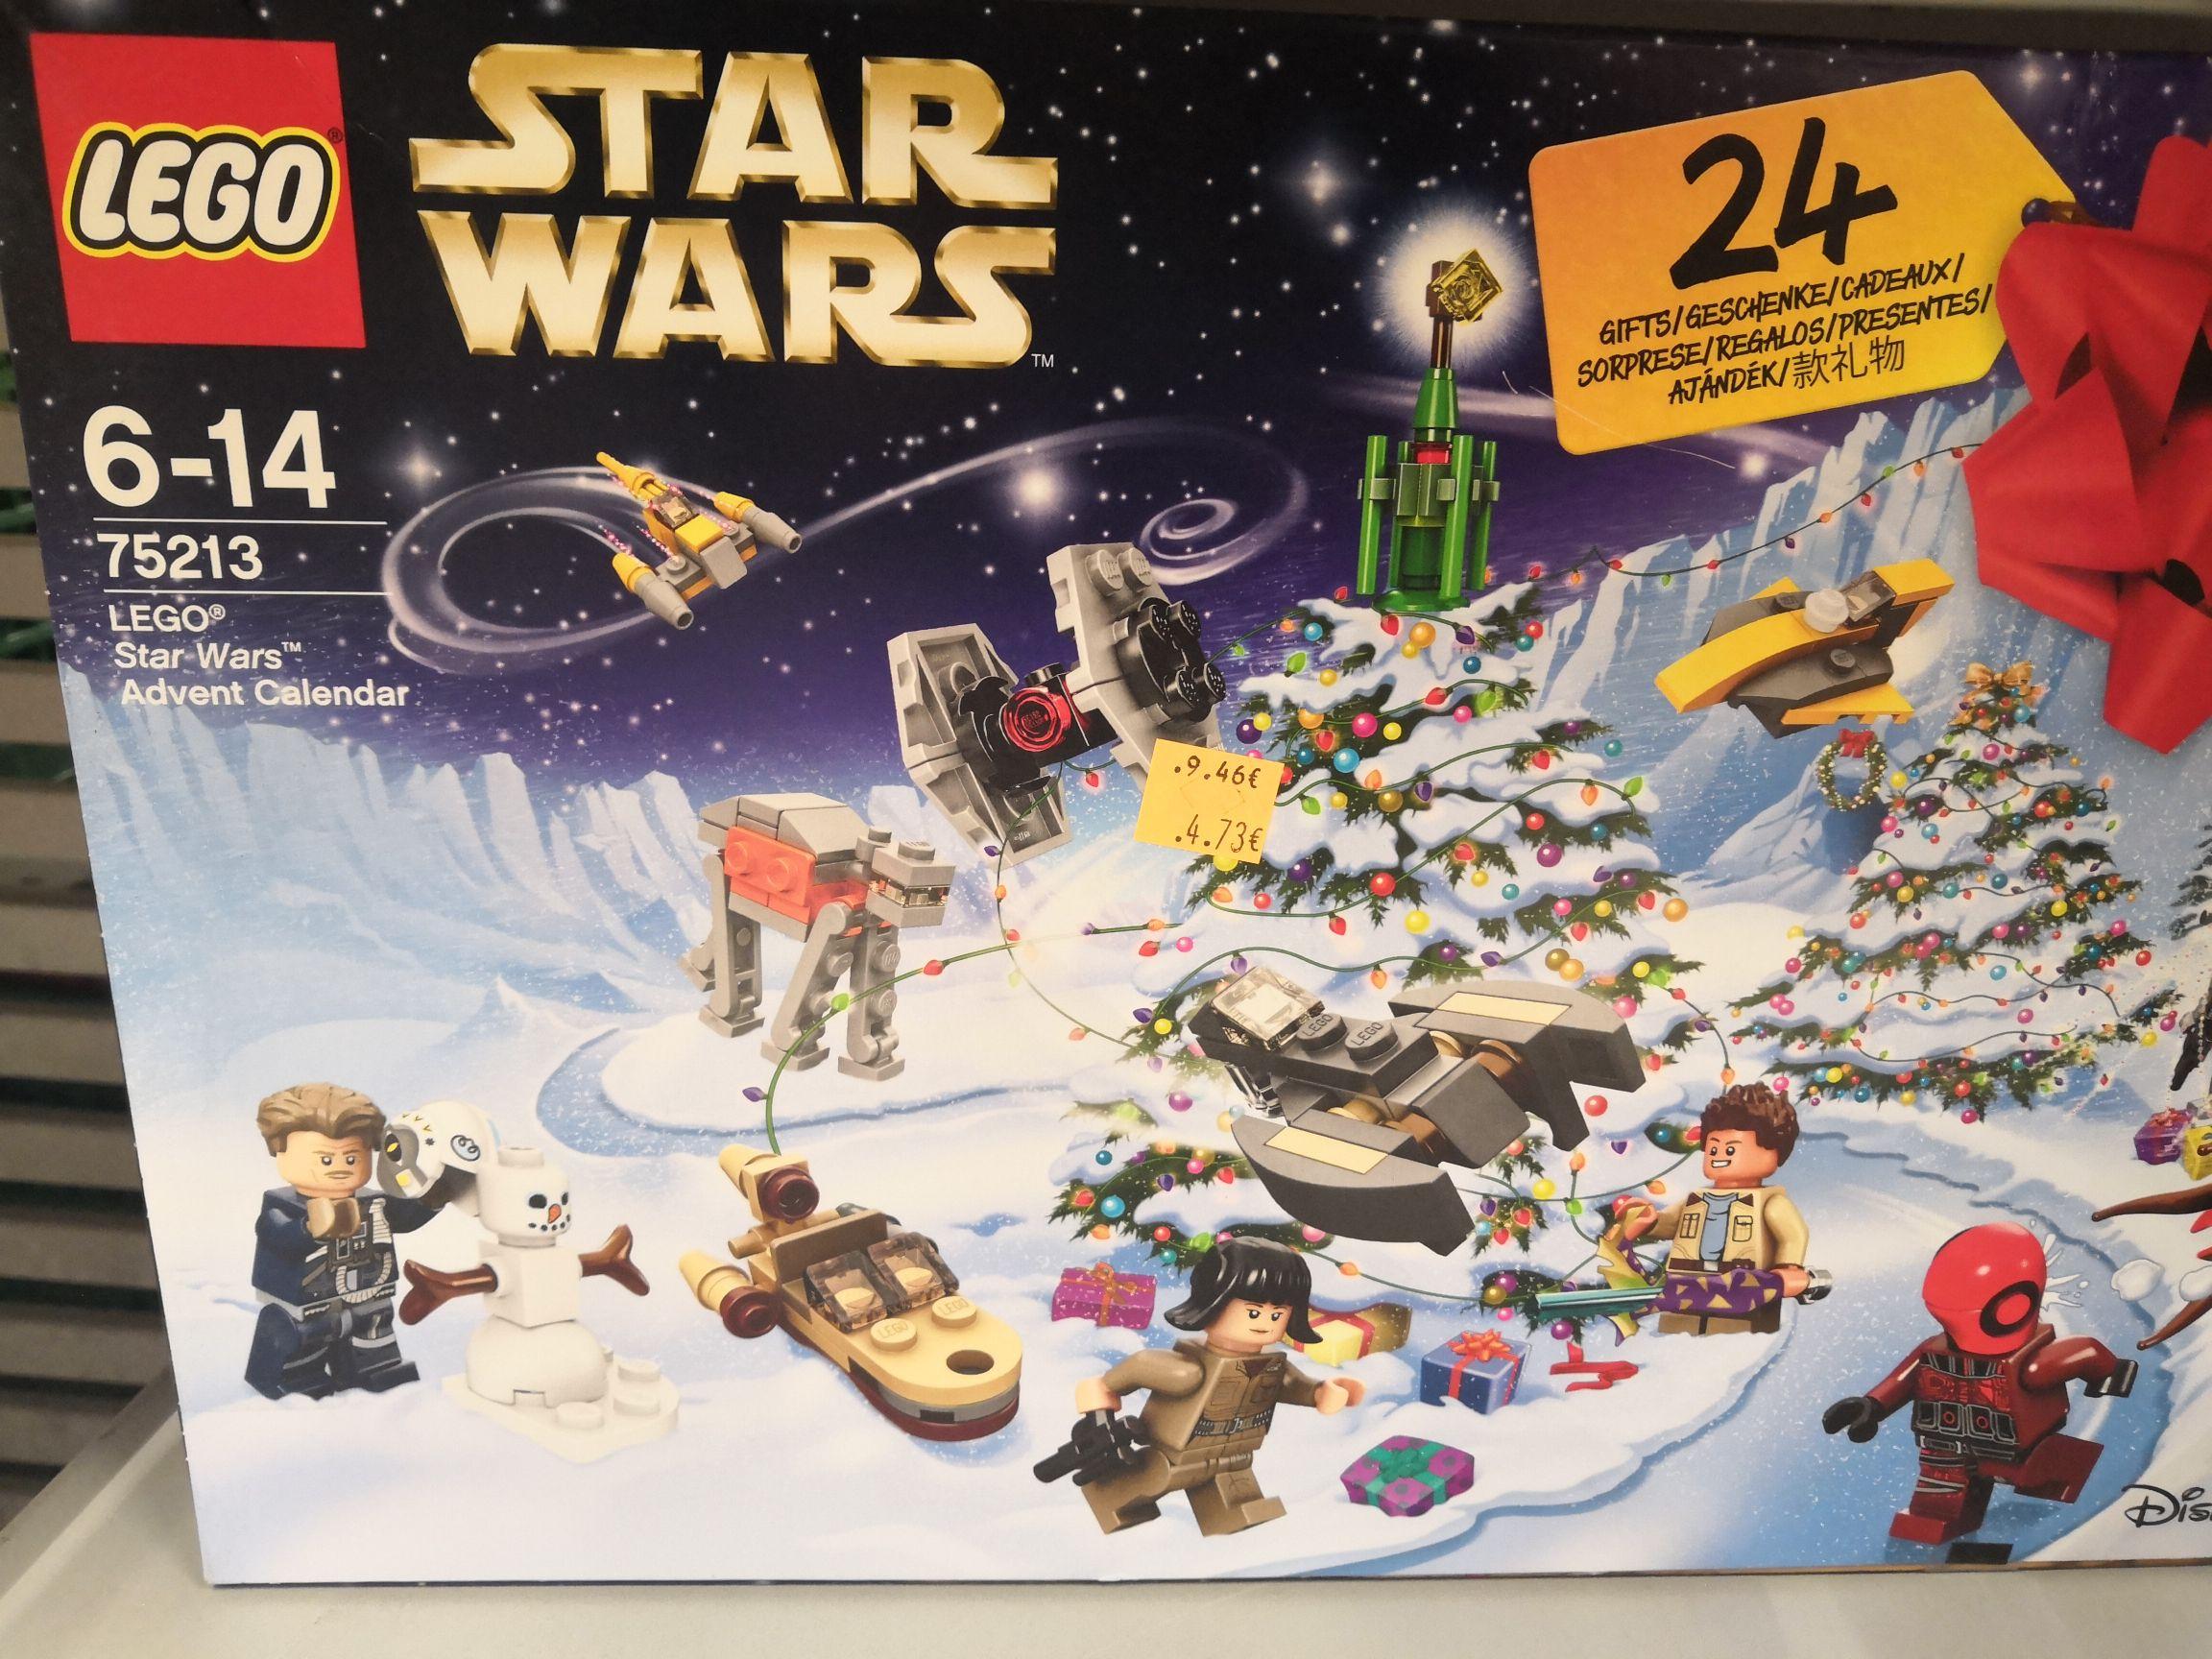 Calendrier De L Avent Lego Star Wars Carrefour.Calendrier De L Avent Lego Star Wars Montesson 78